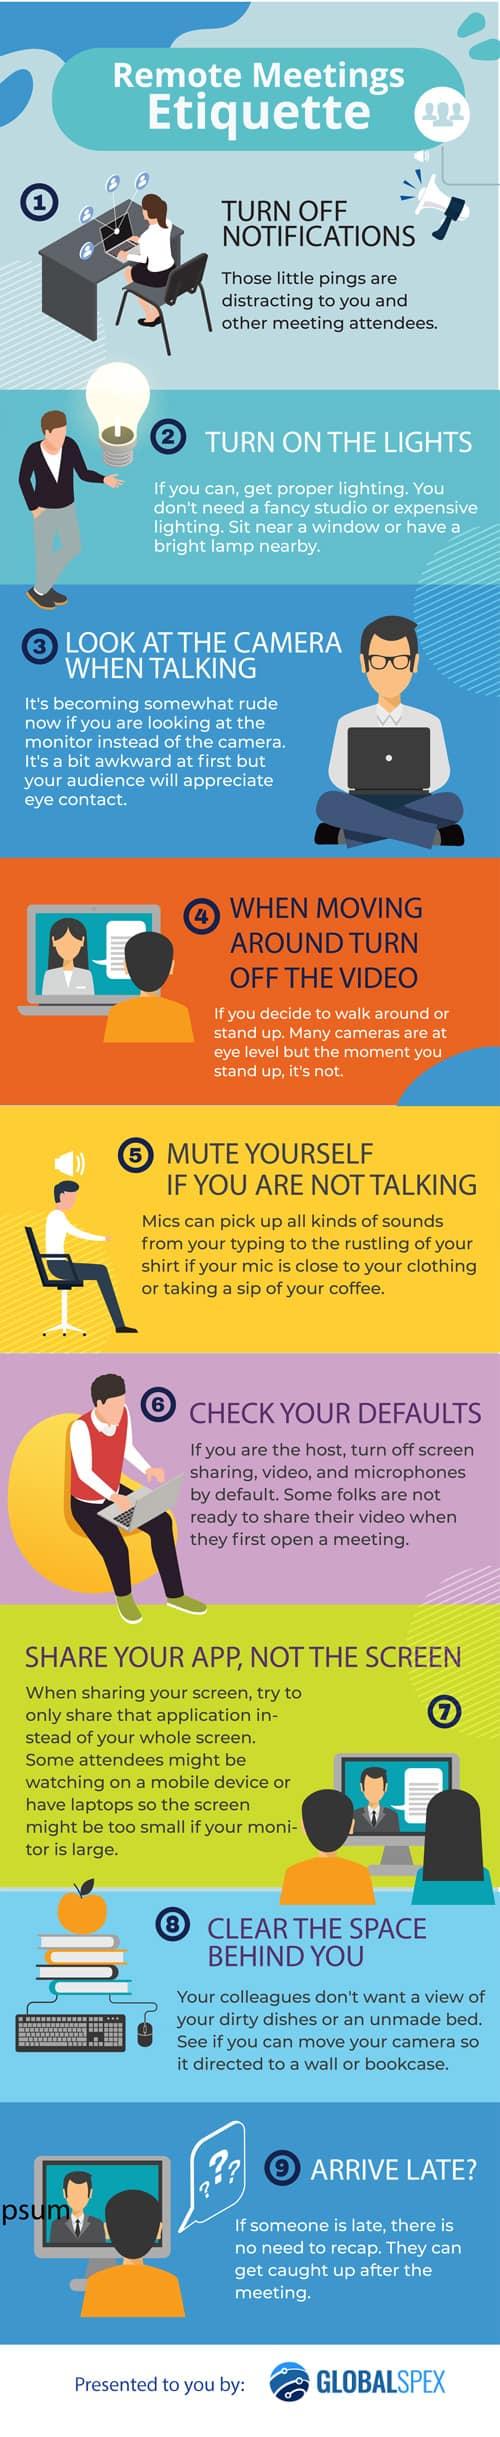 Zoom Remote Meeting Etiquette